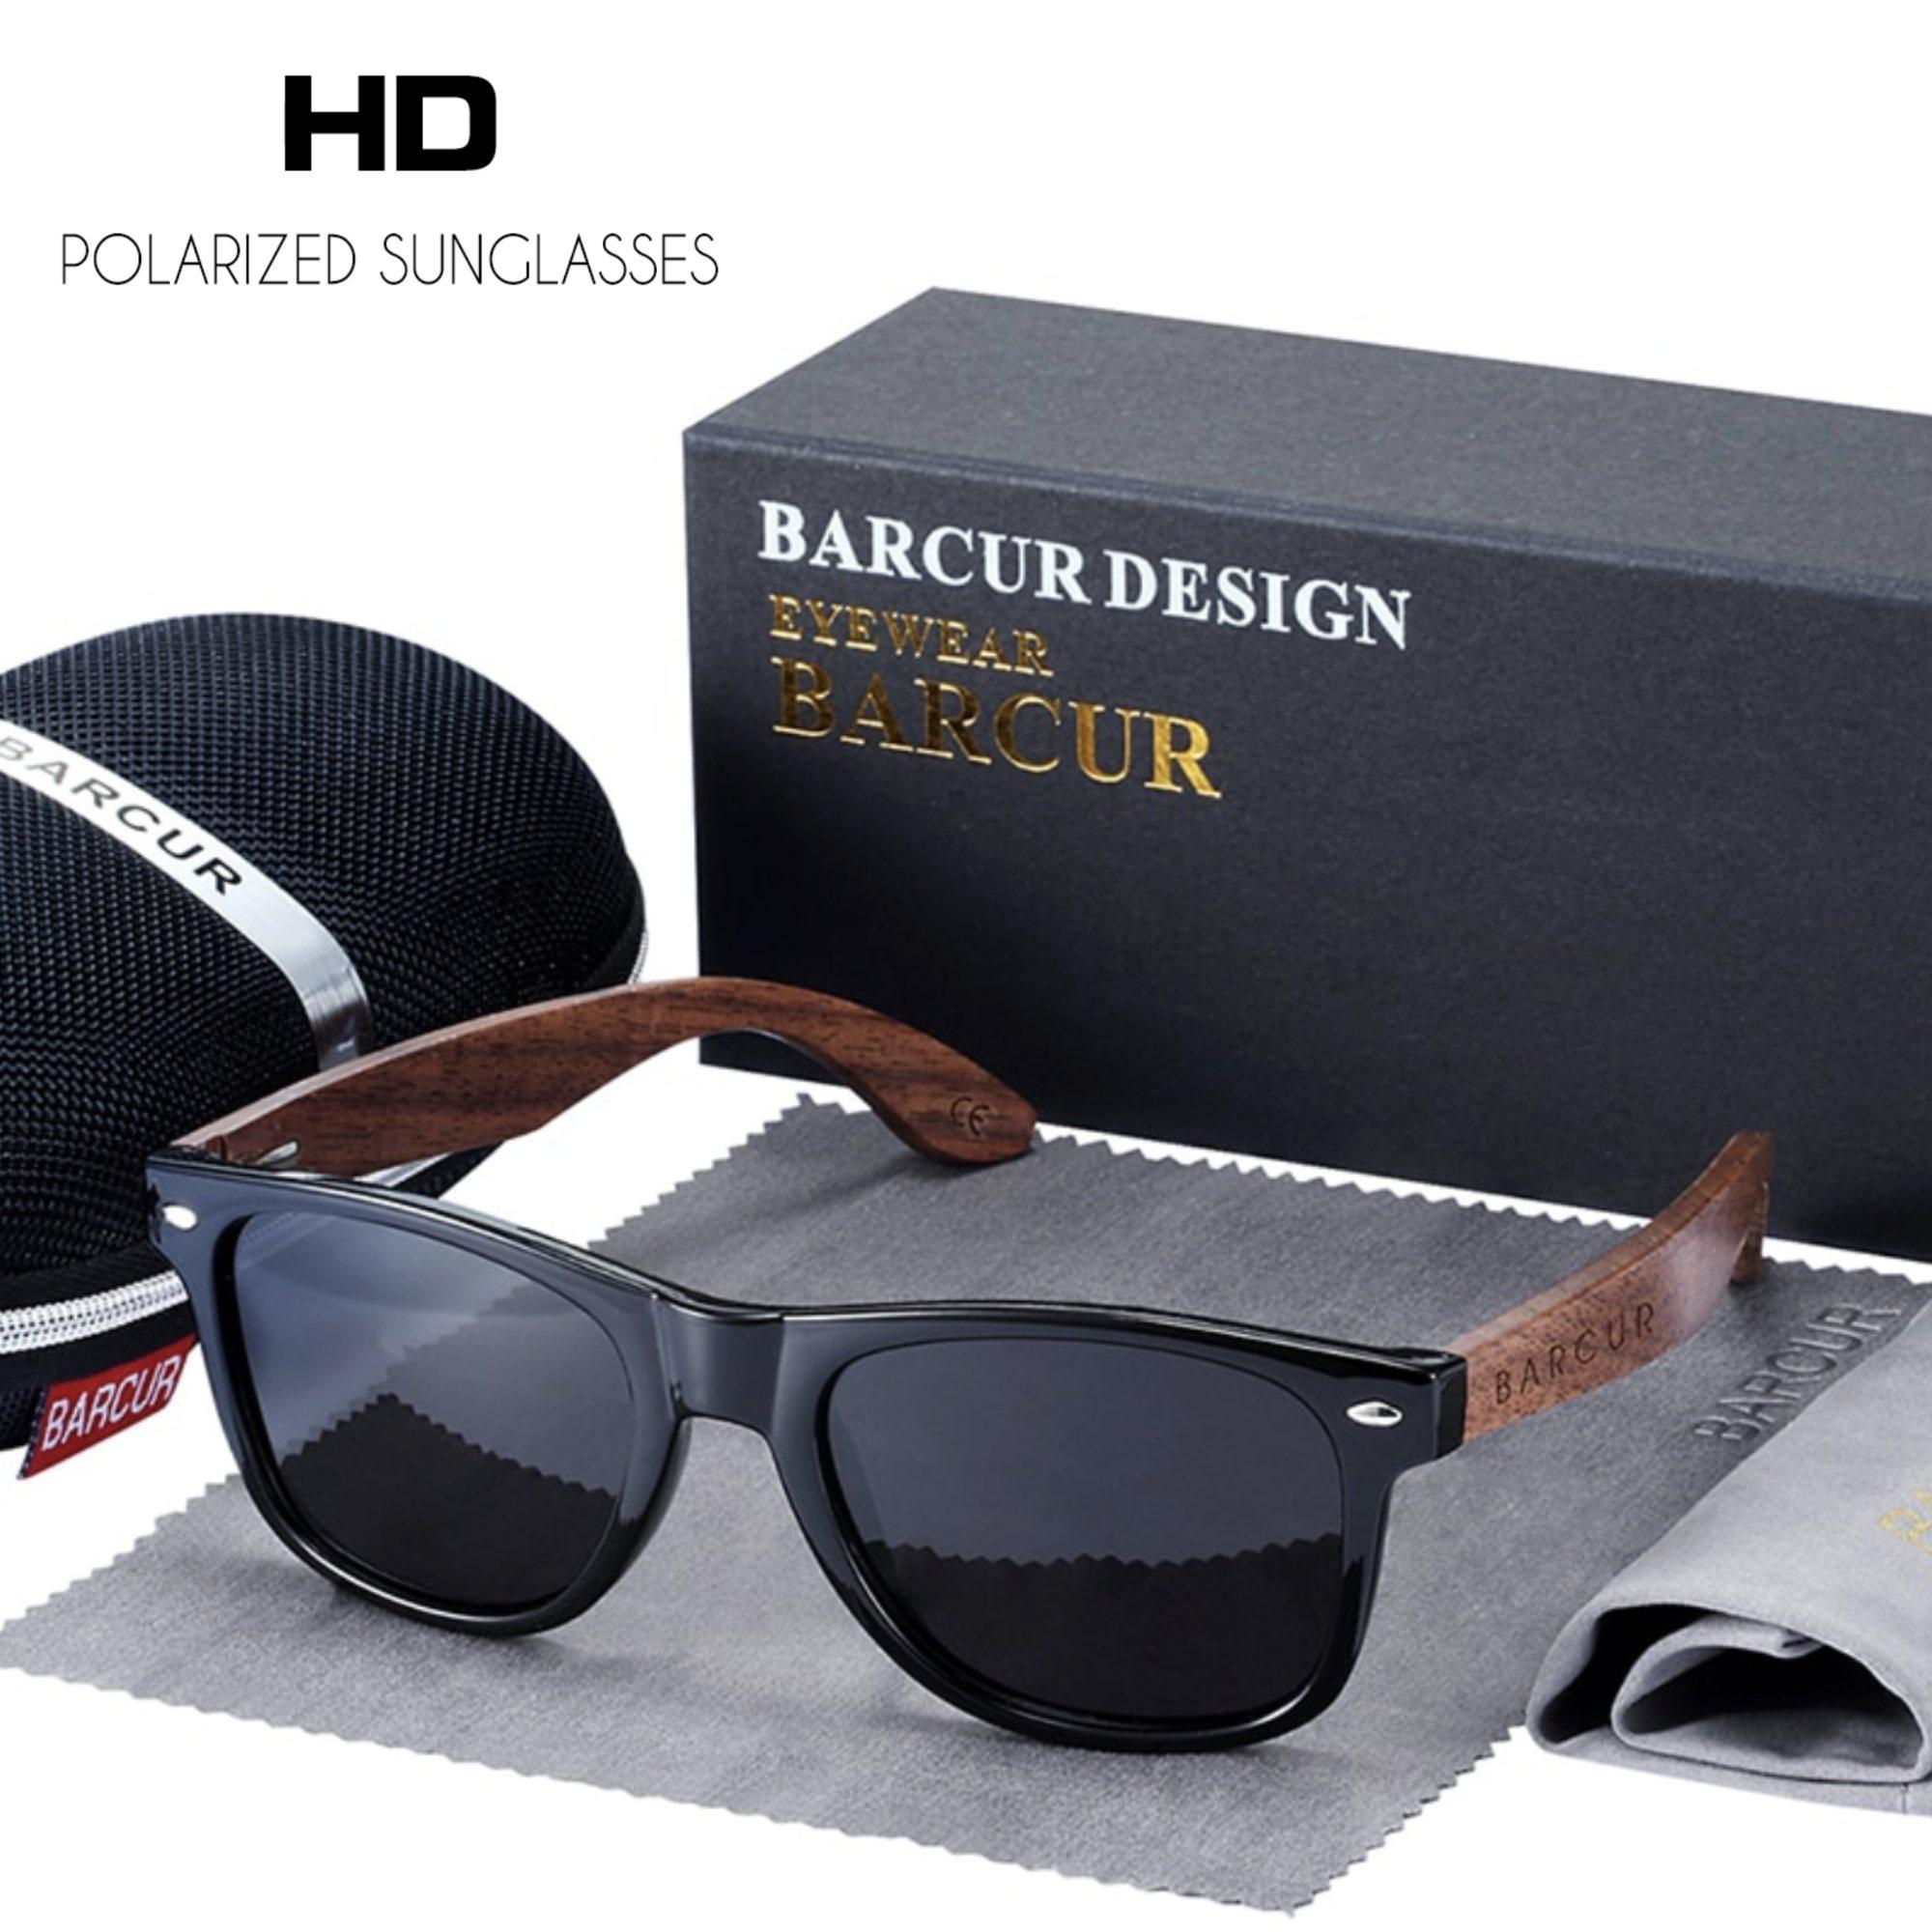 Óculos de Sol Barcur 8700 Bambu com Lente Polarizada UV400